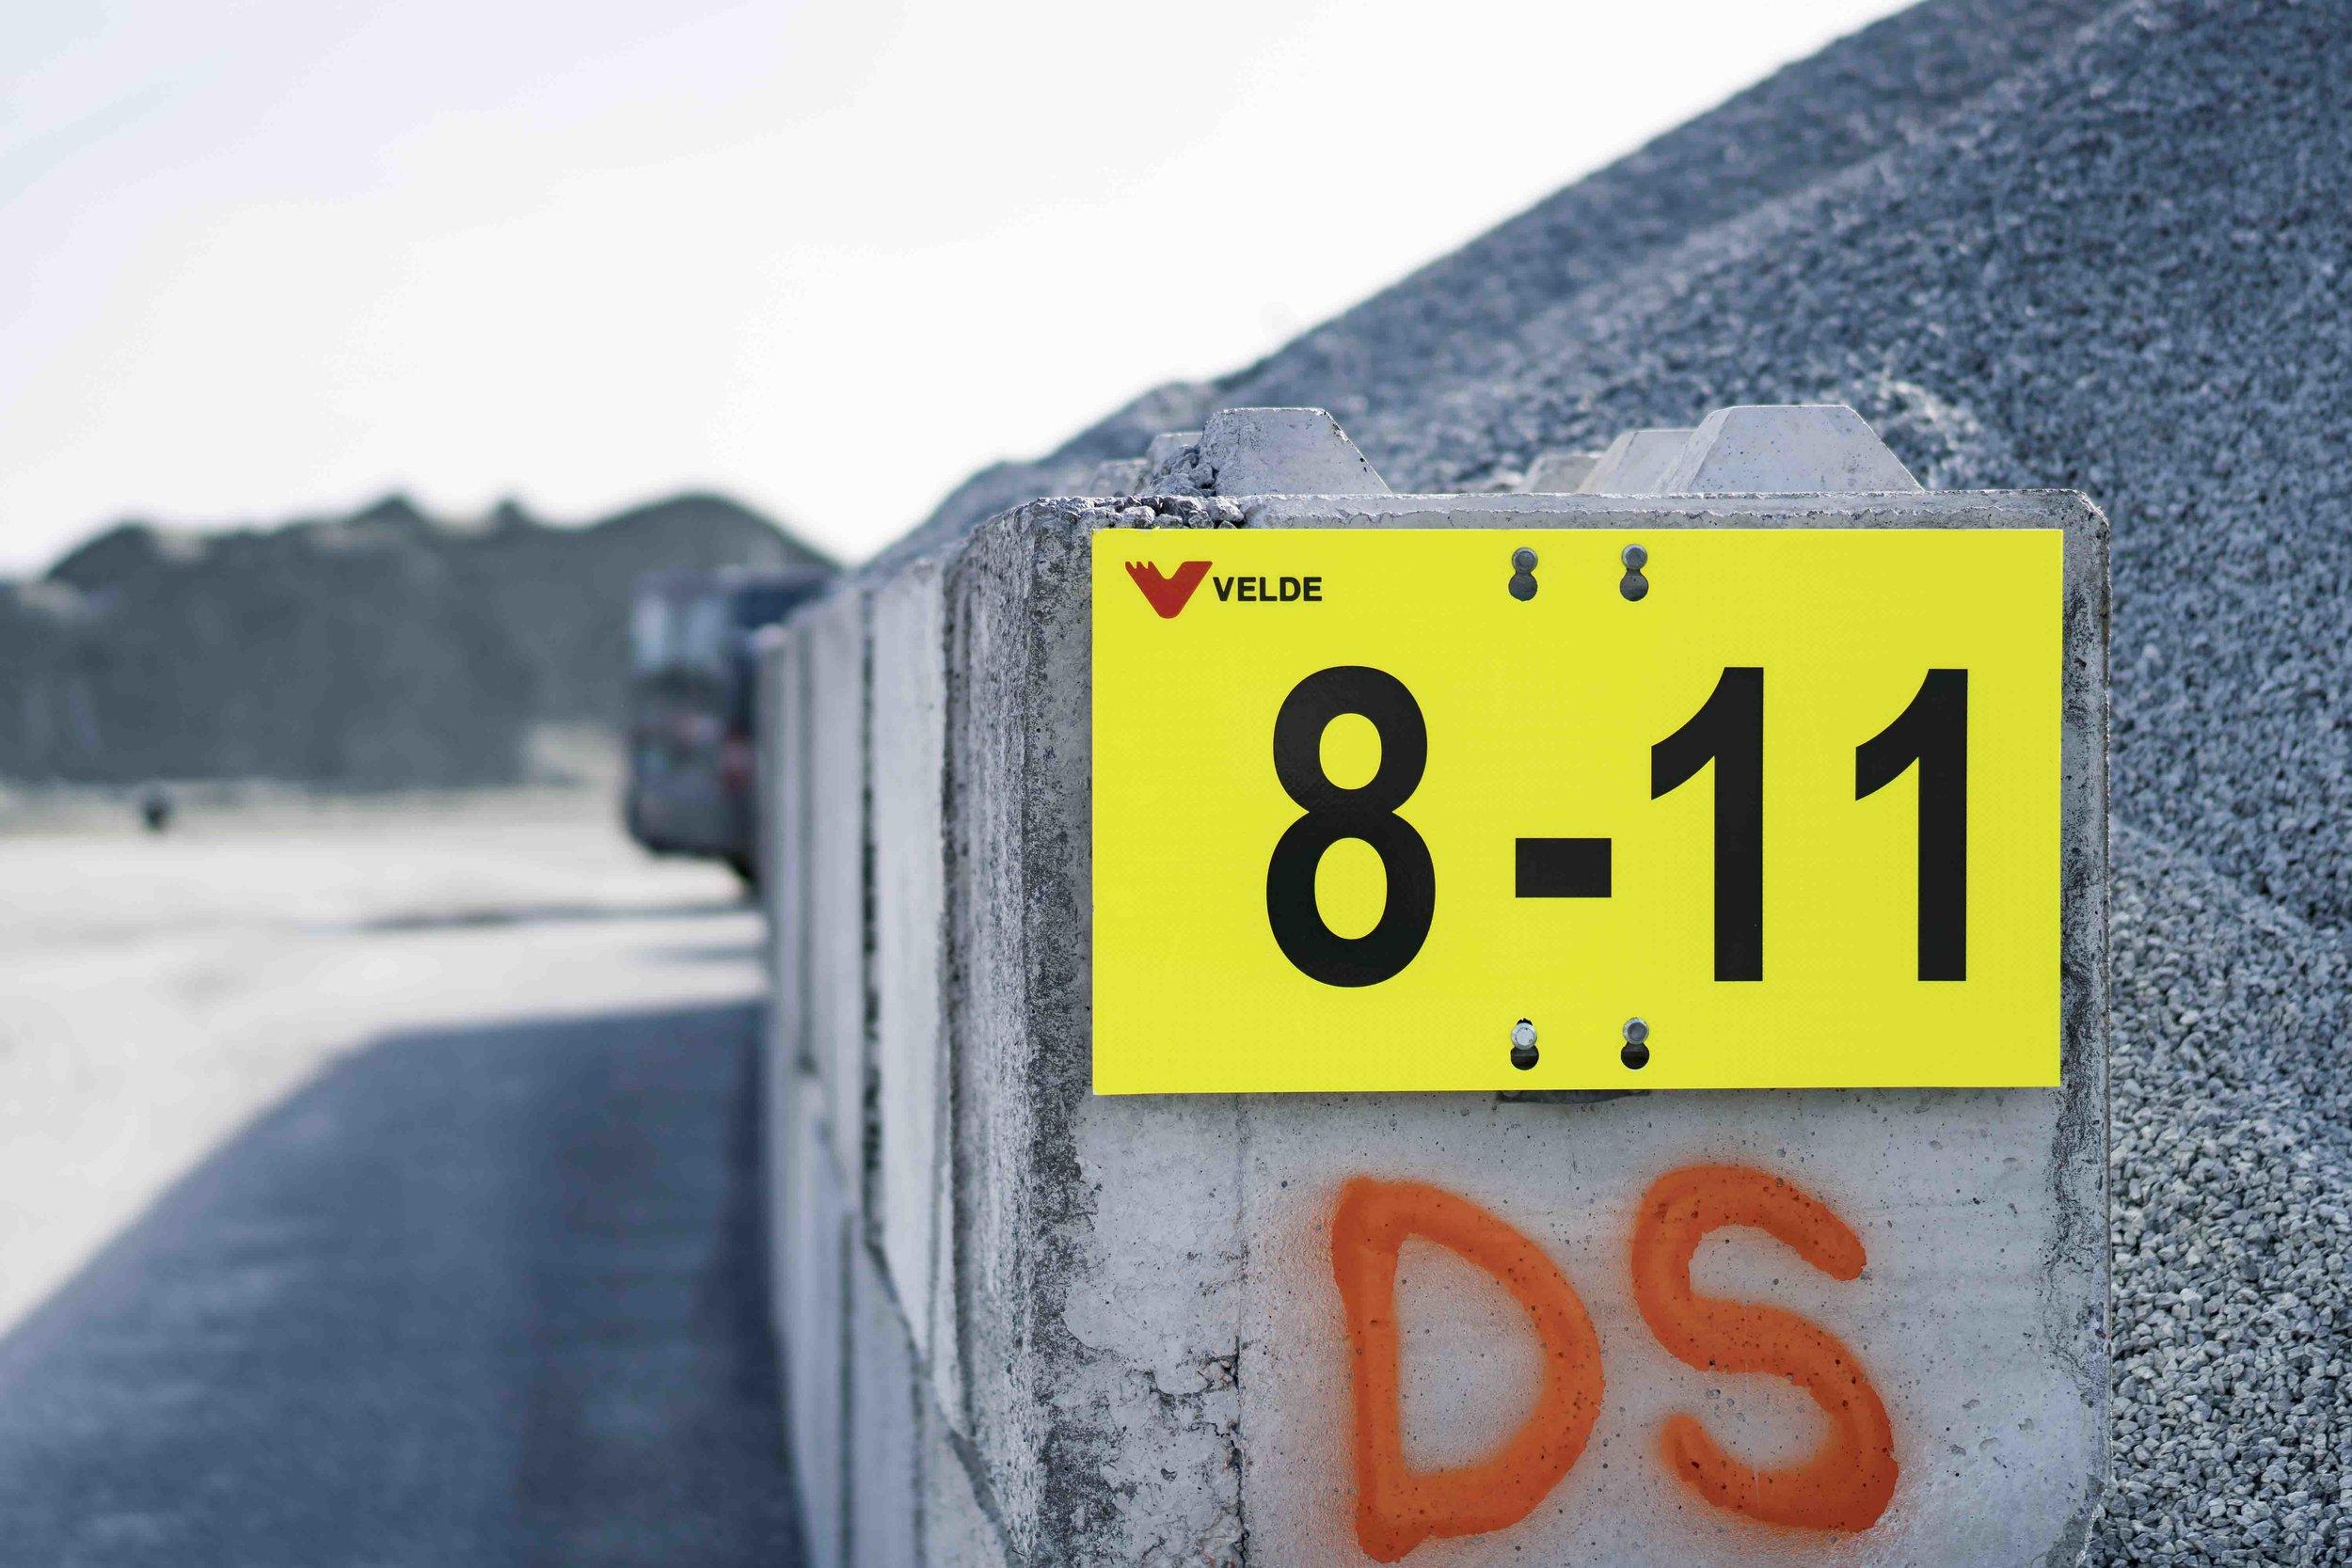 010a6300 haugalandet - DSC00452.jpg